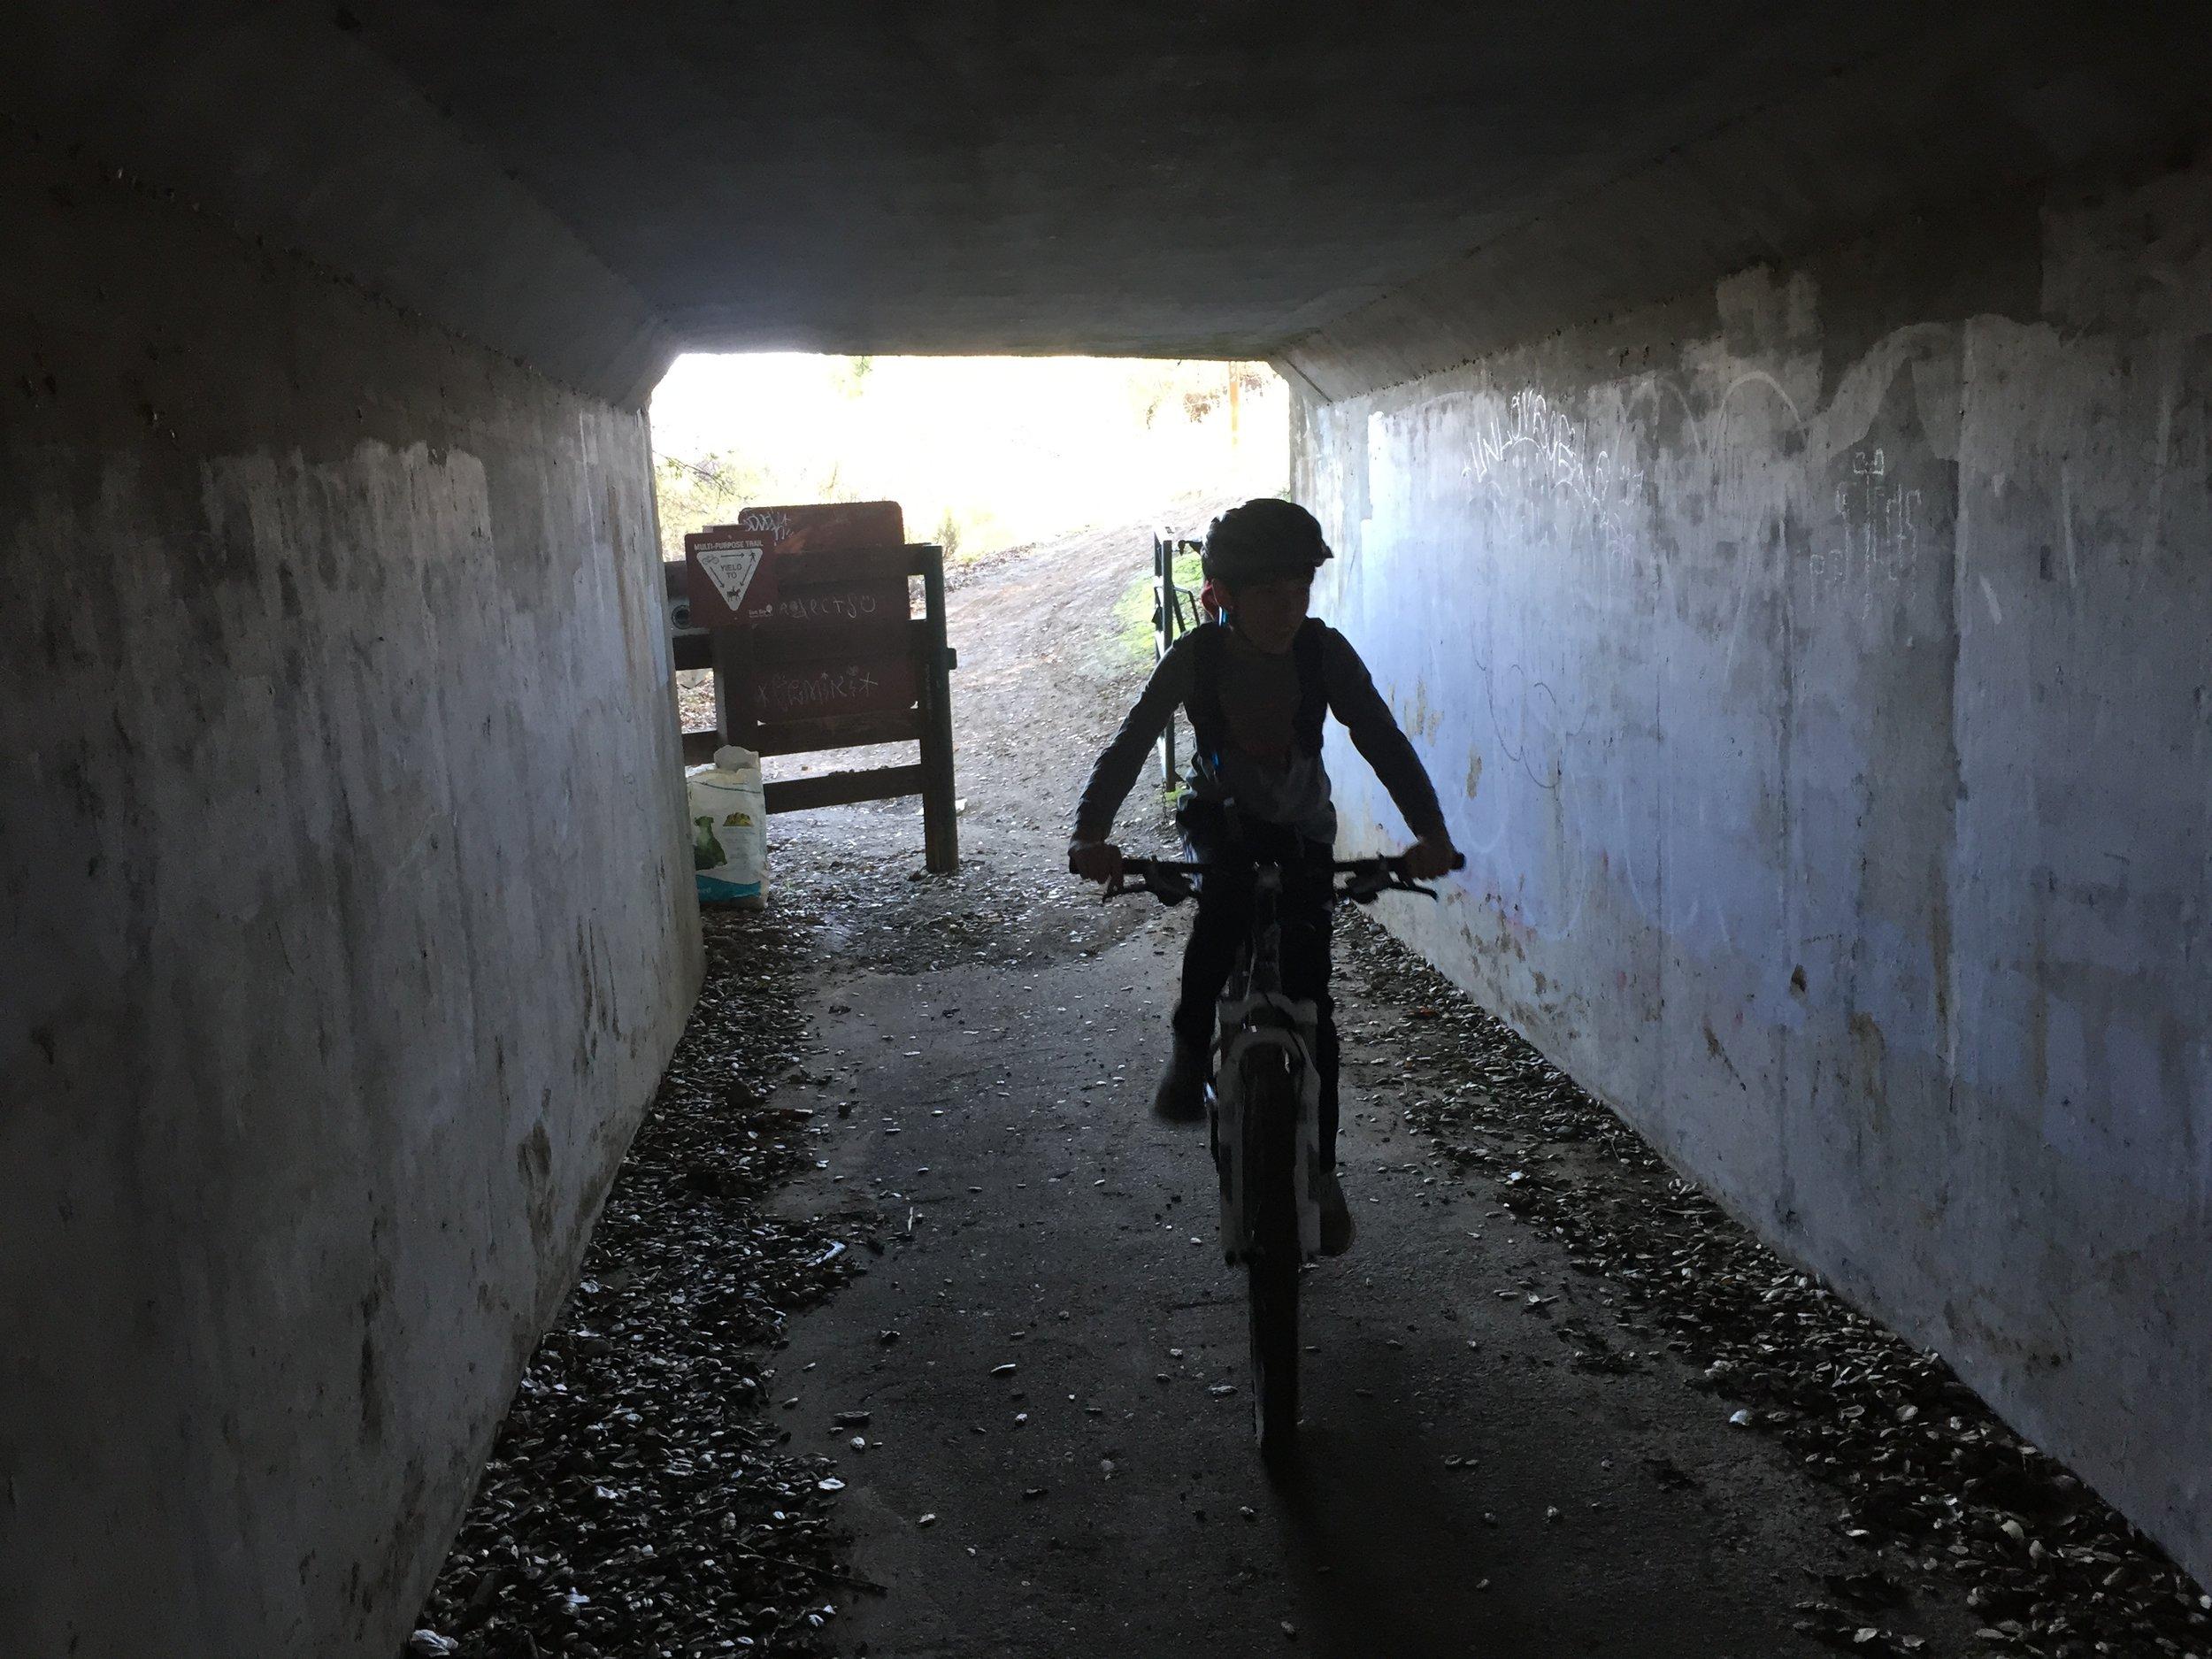 Lucas rides through the tunnel under Cummings Skyway.